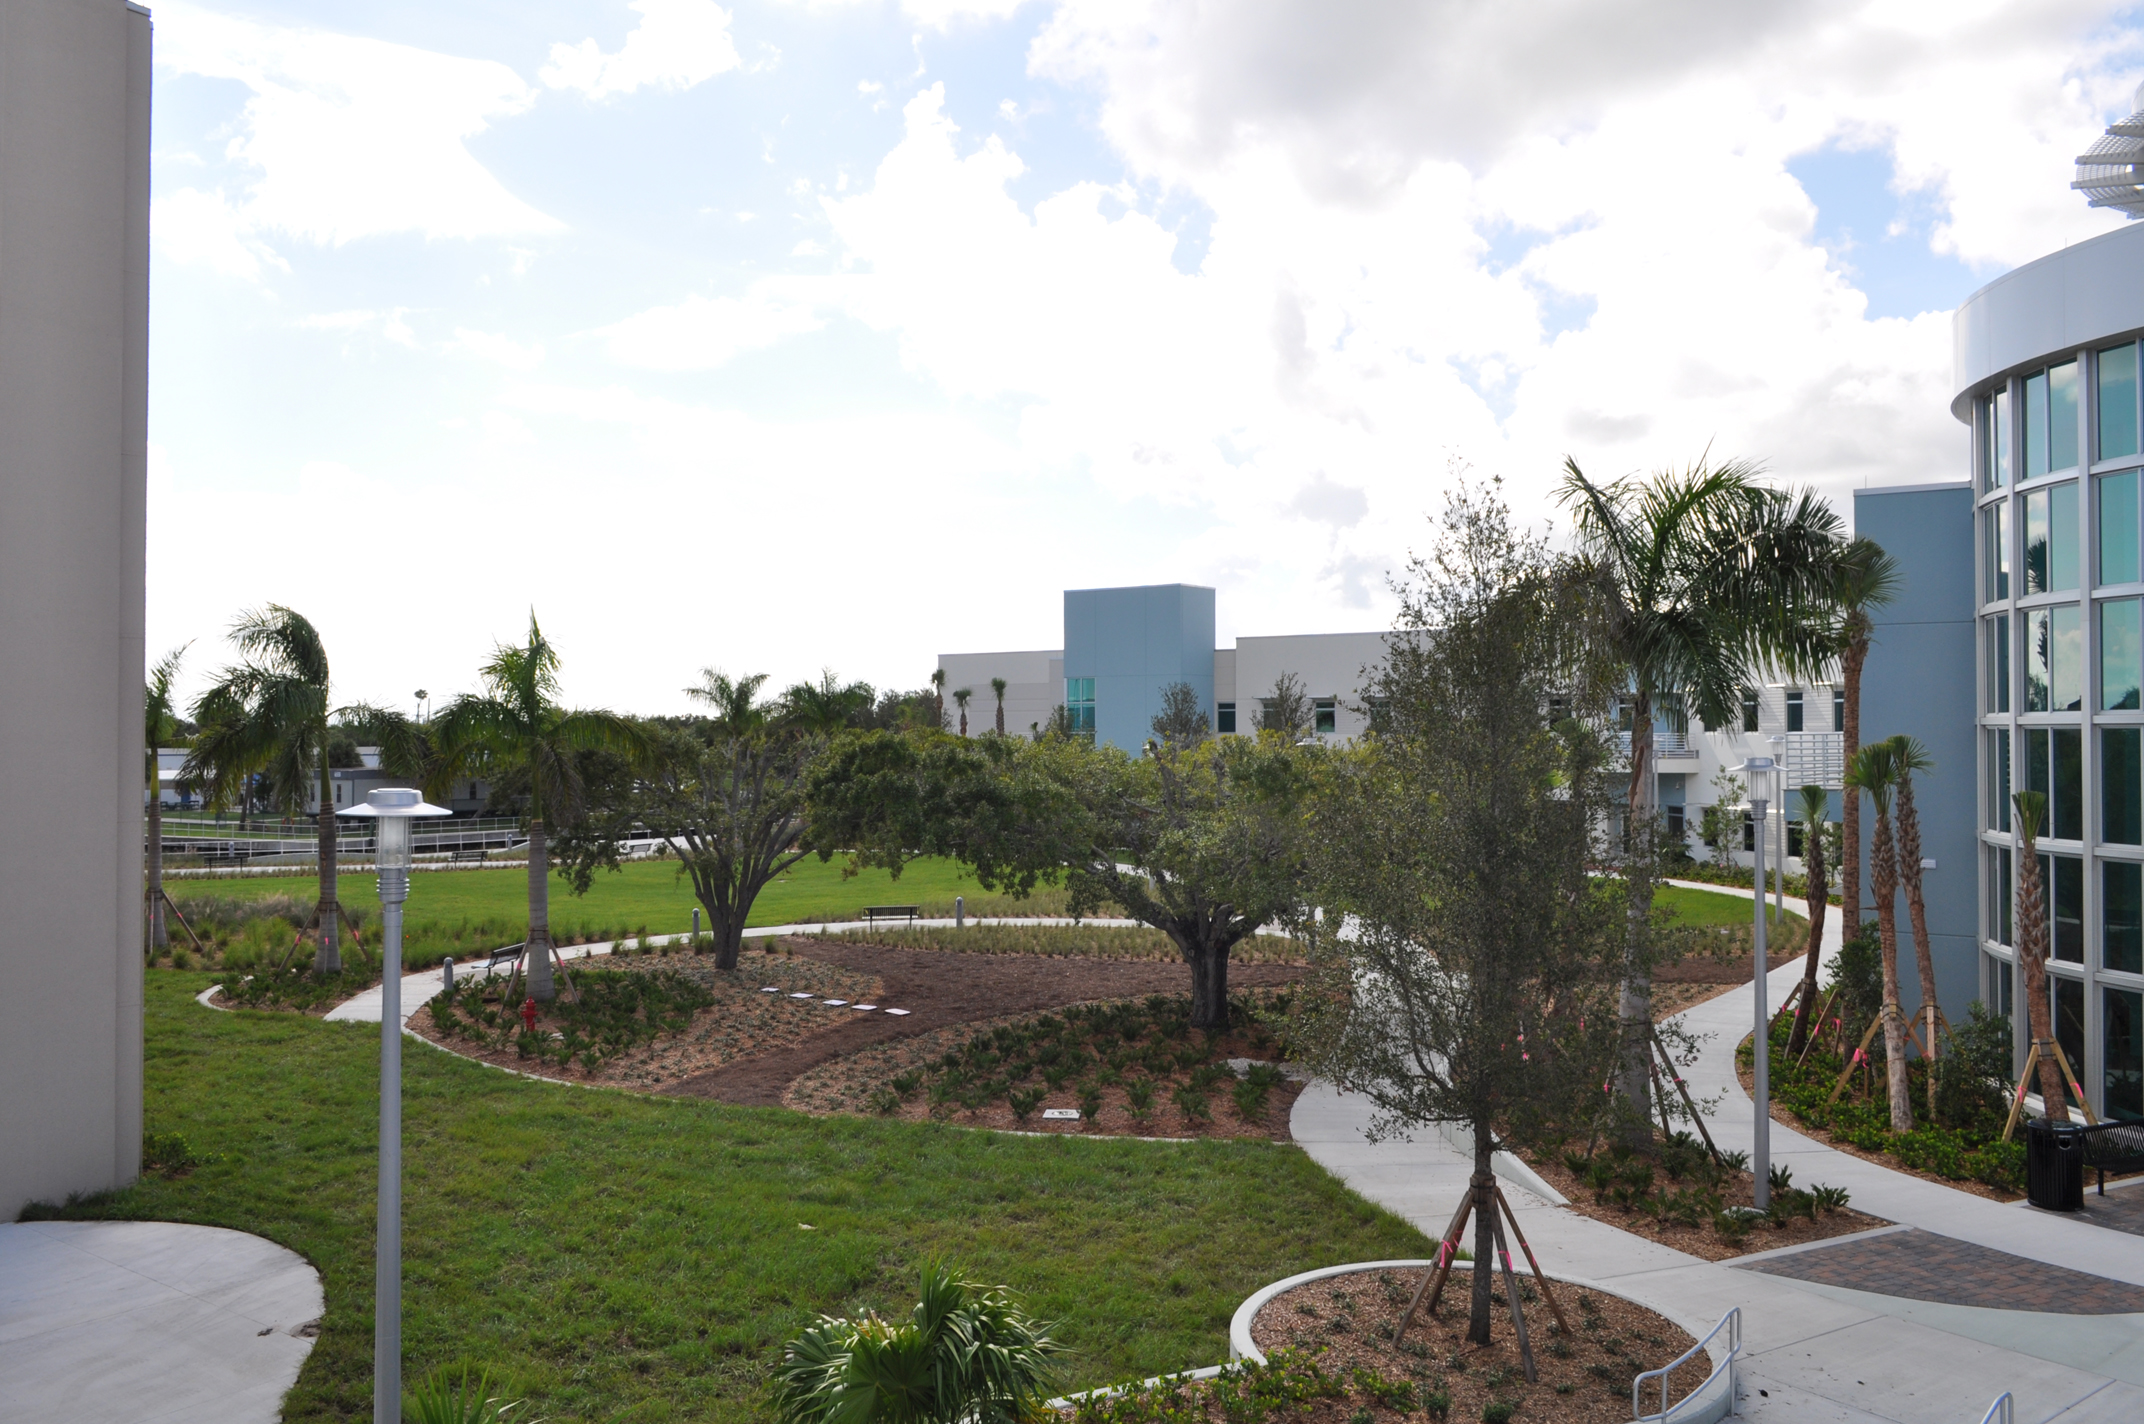 Harbor Branch Oceanographic Institute at FAU Research Laboratory II Courtyard Oak View.JPG